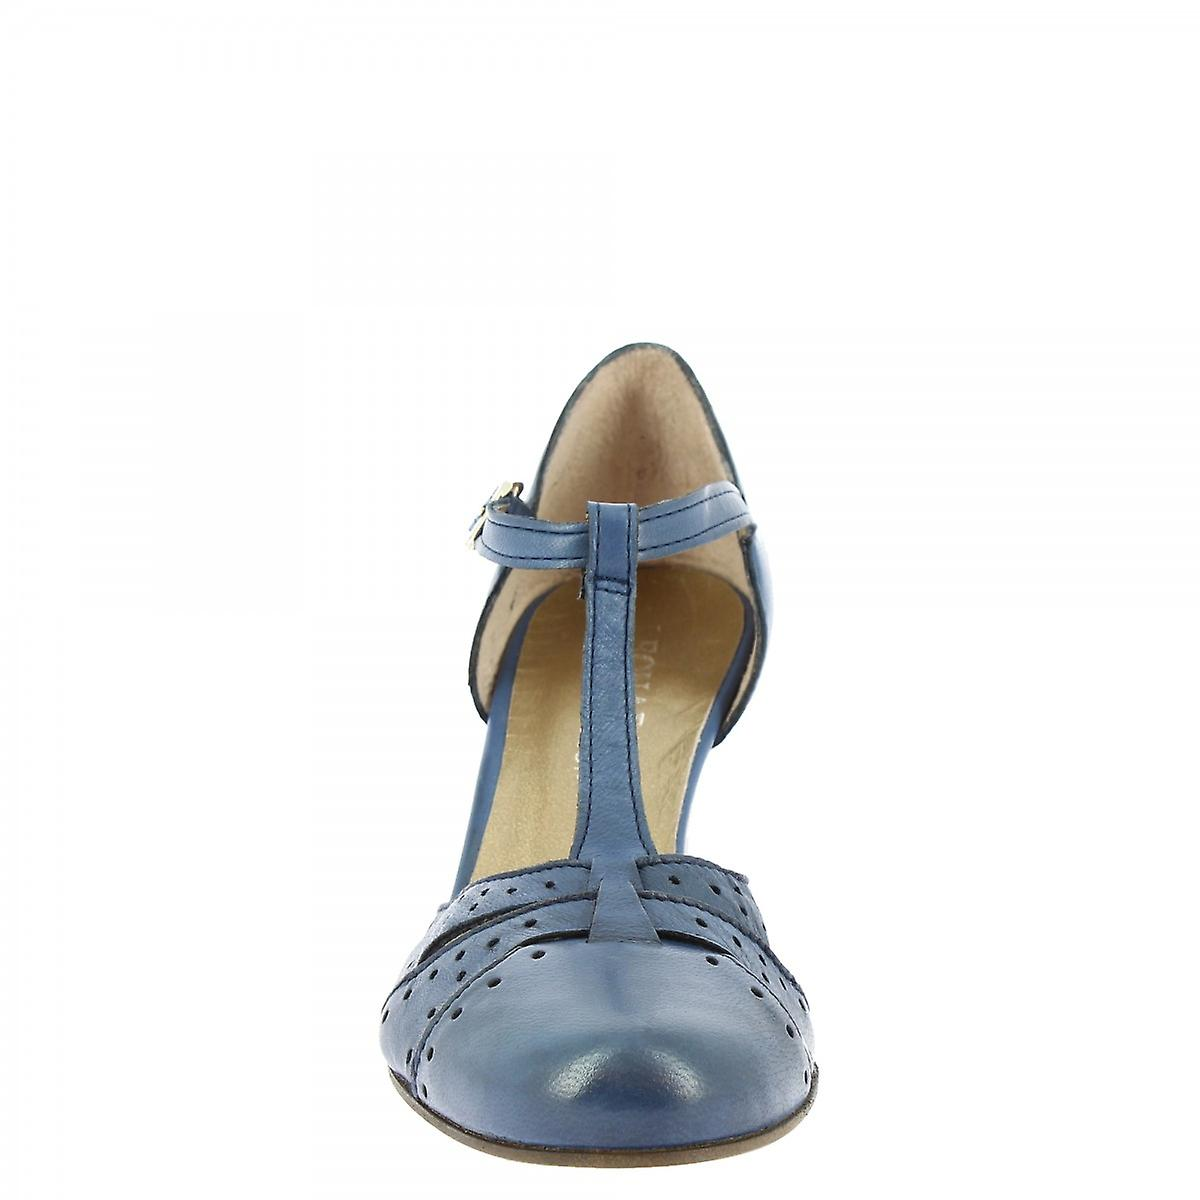 Leonardo Shoes Women's Handmade Dance Mid Heels Pumps Blue Napa Leather